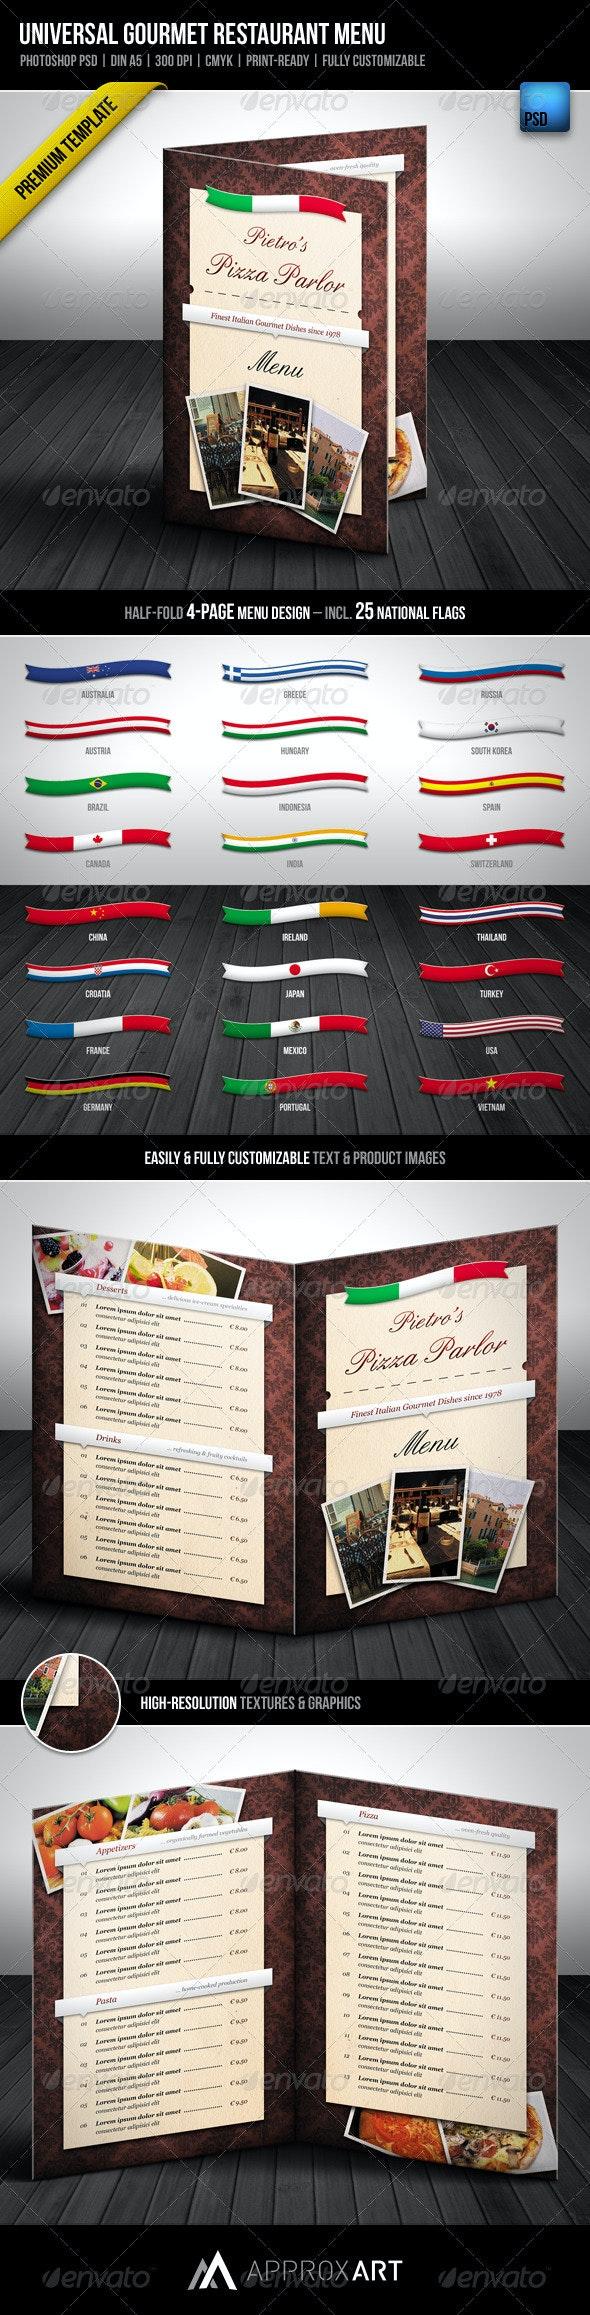 Universal Gourmet Restaurant Menu - Food Menus Print Templates